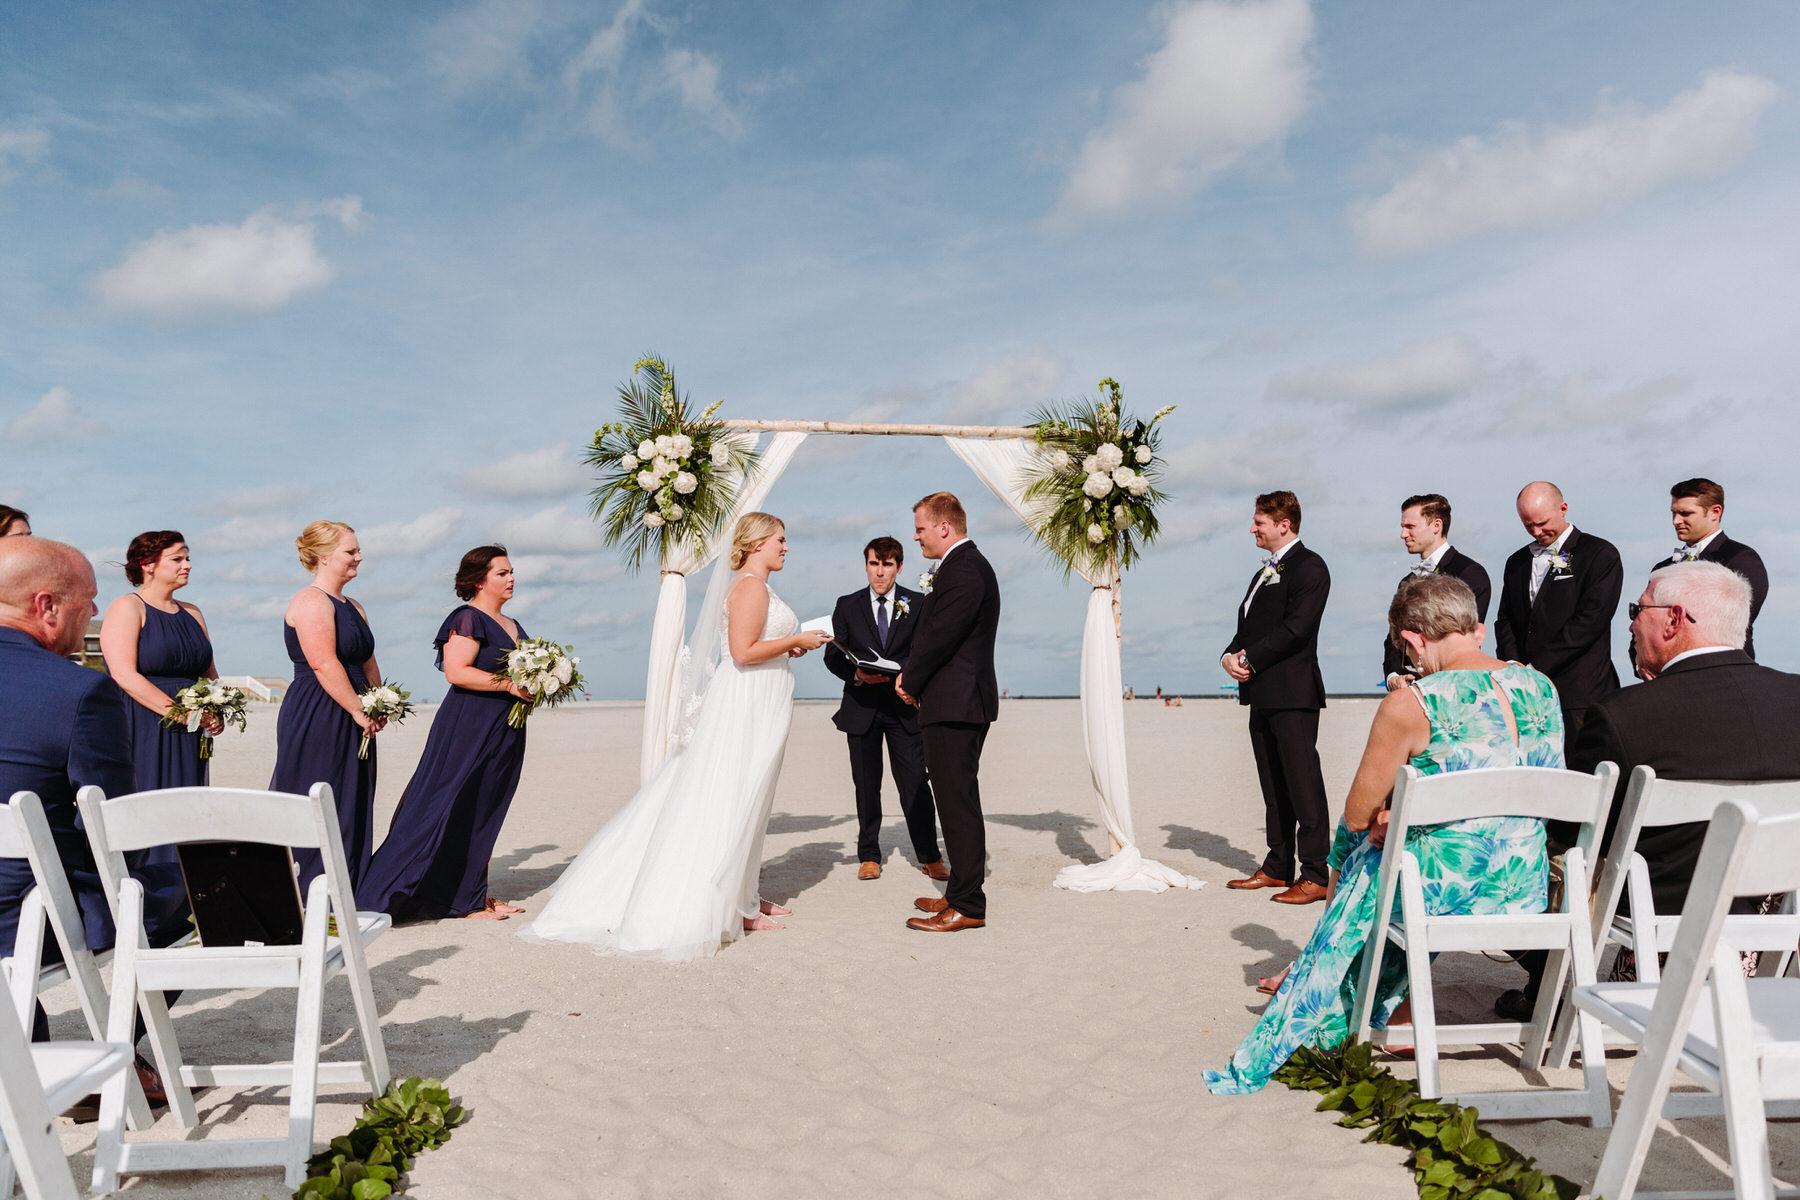 wild-dunes-charleston-isle-of-palms-IOP-wedding-810.JPG